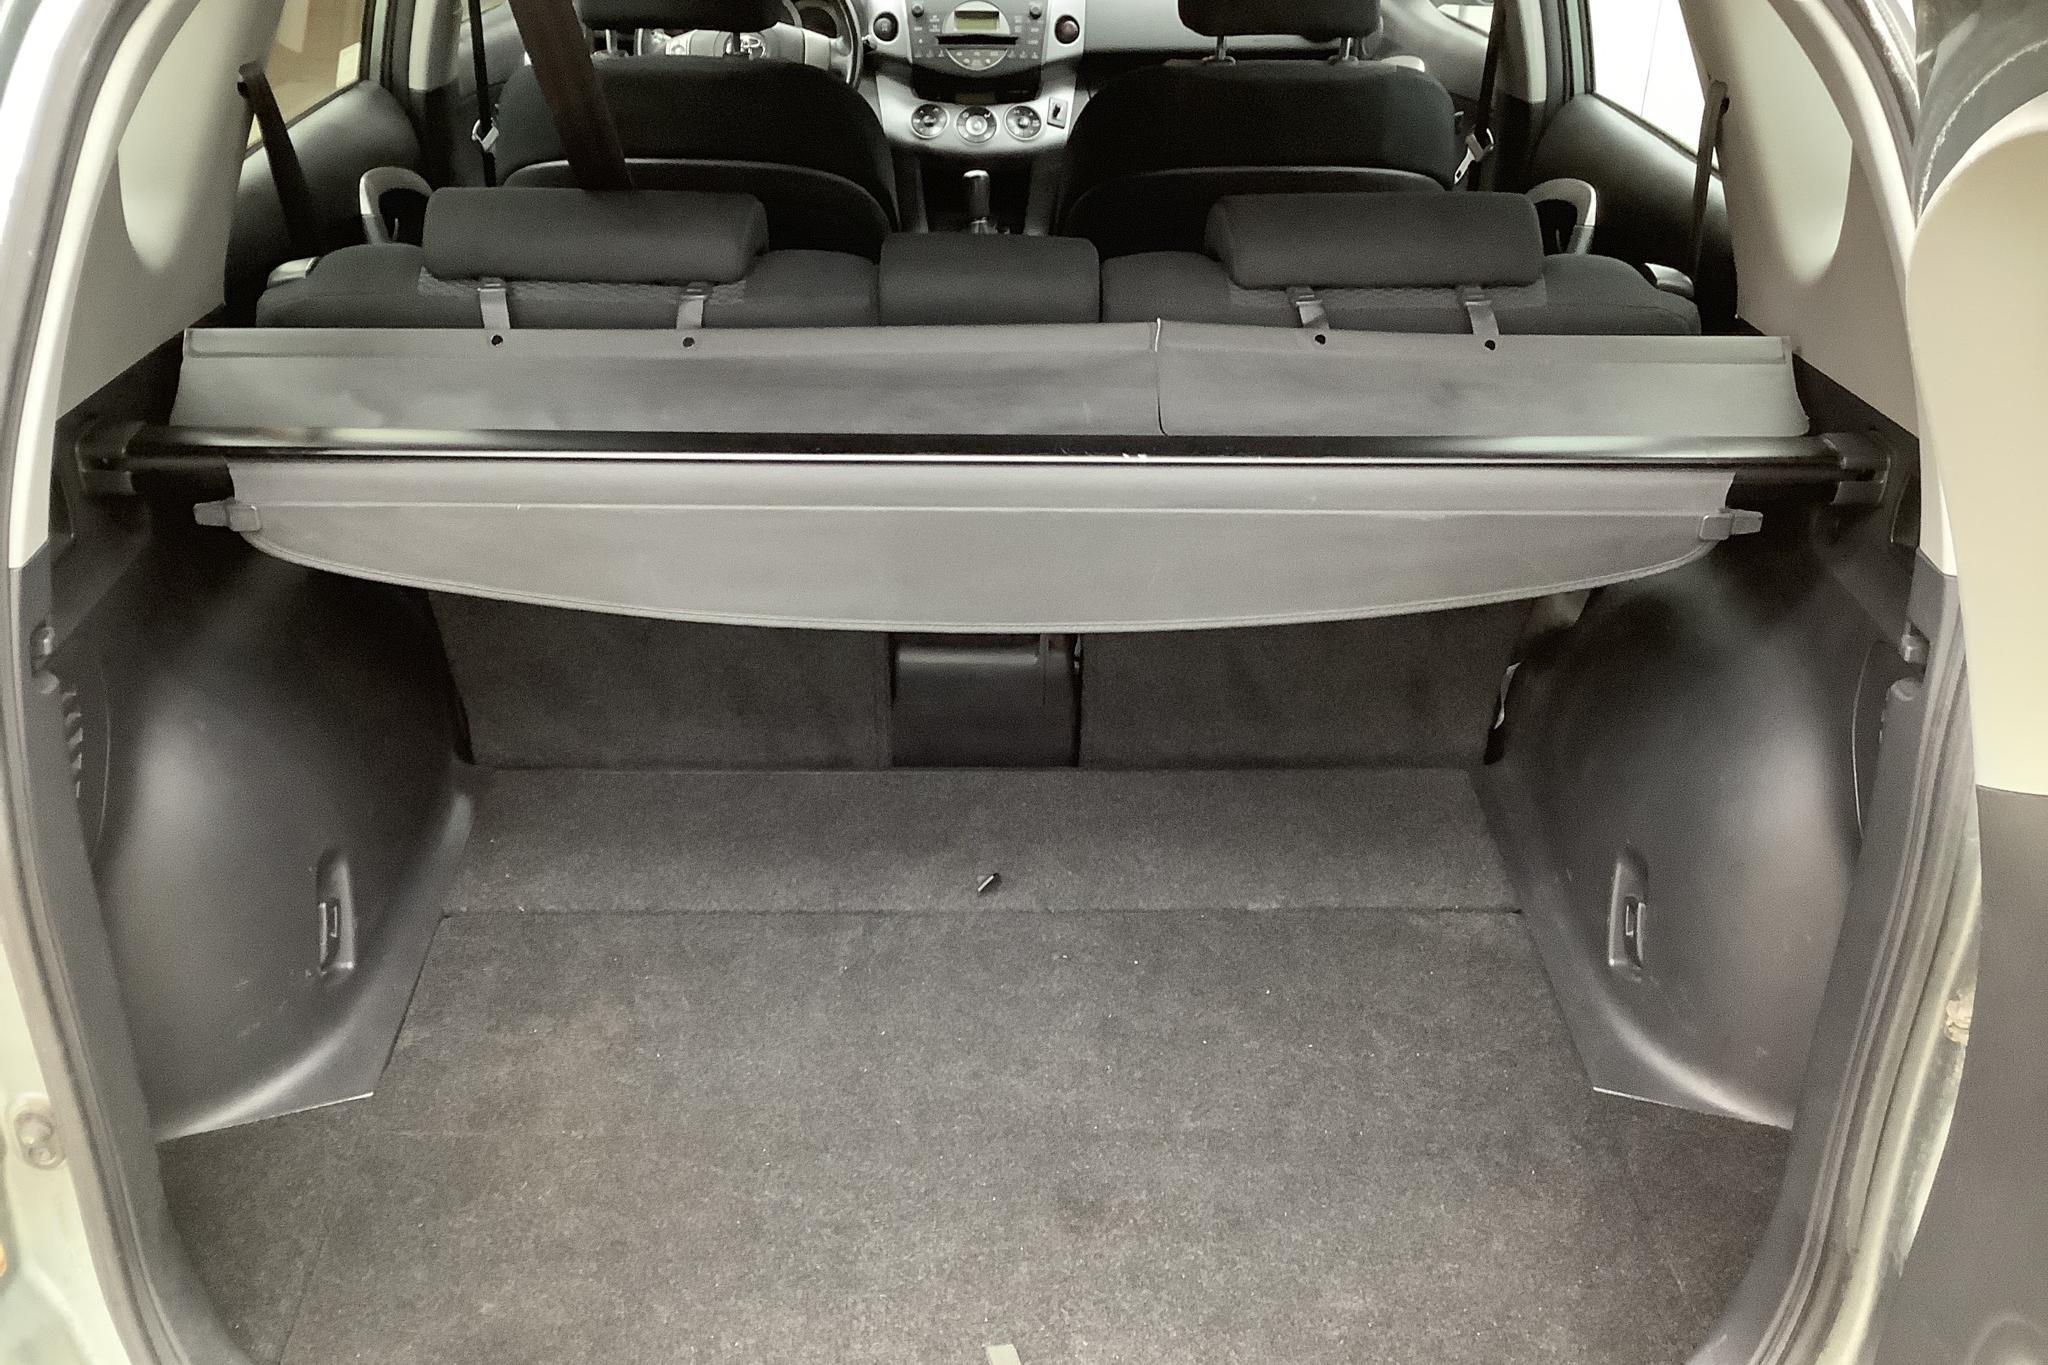 Toyota RAV4 2.0 (152hk) - 121 840 km - Manual - Light Green - 2007